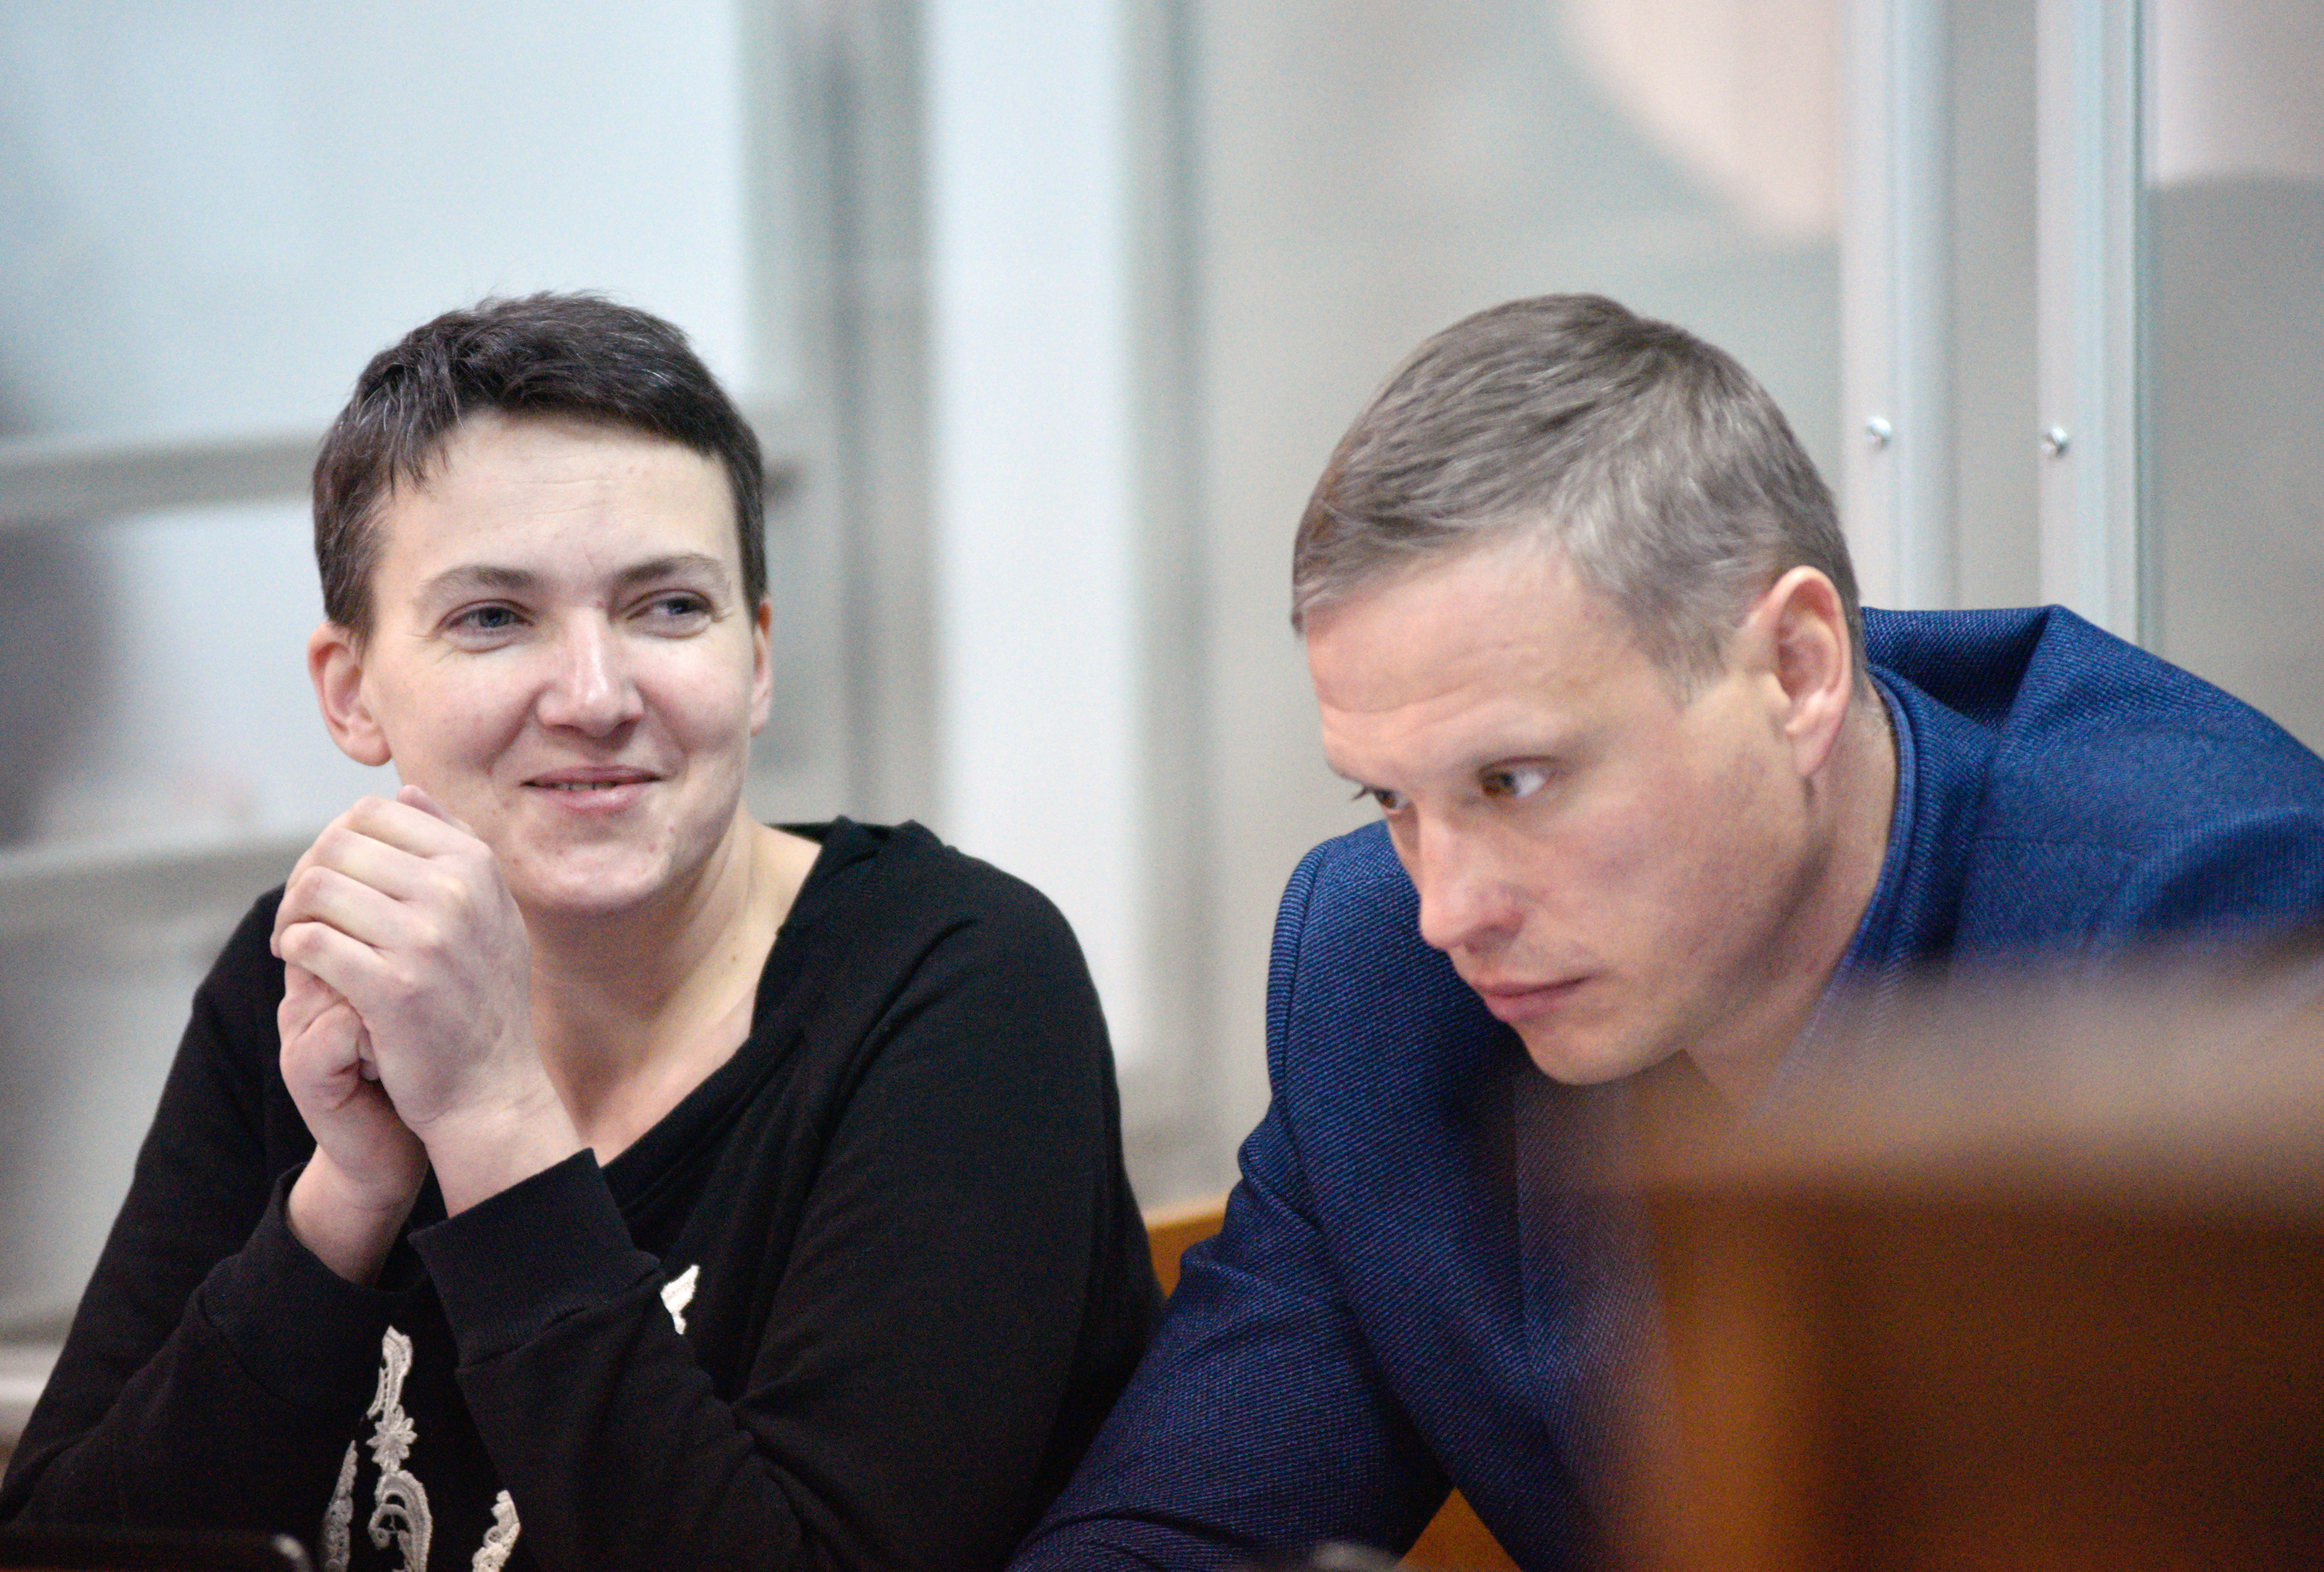 <p><span>Надежды Савченко и её адвокат Дмитрий Бугай. Фото: &copy;РИА Новости/Стрингер</span></p>